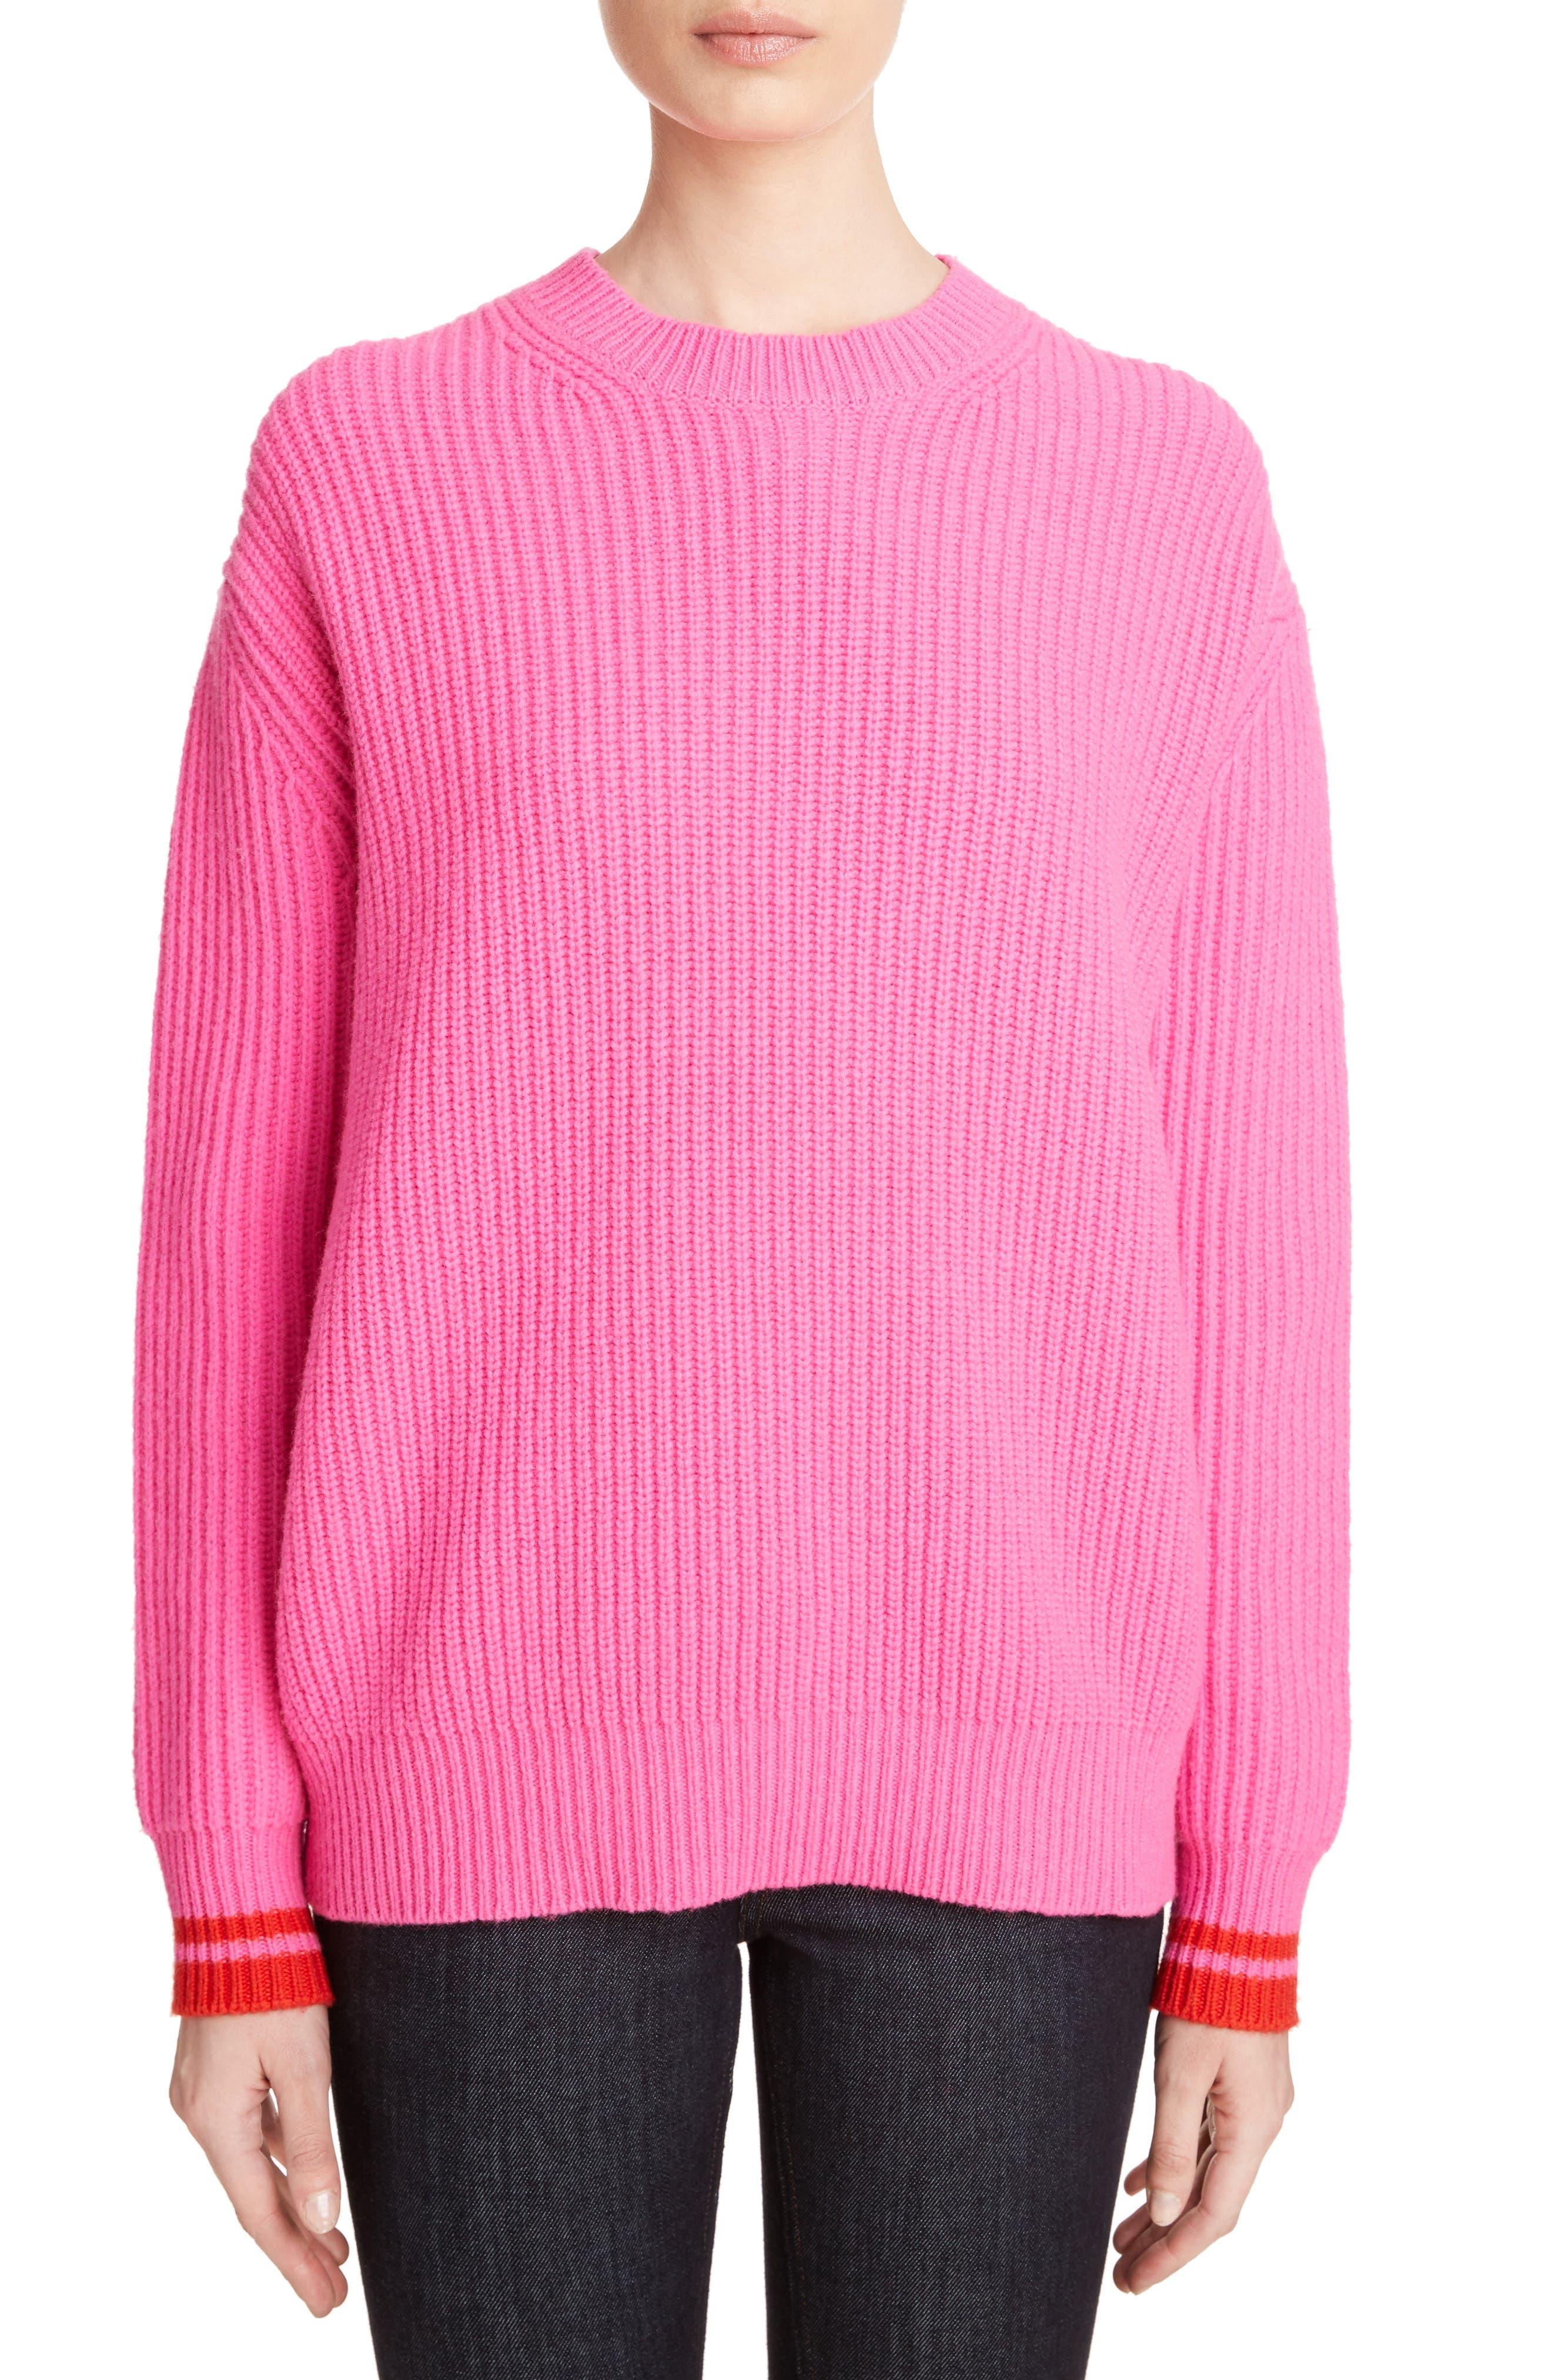 Lambswool Boyfriend Sweater,                         Main,                         color, 650